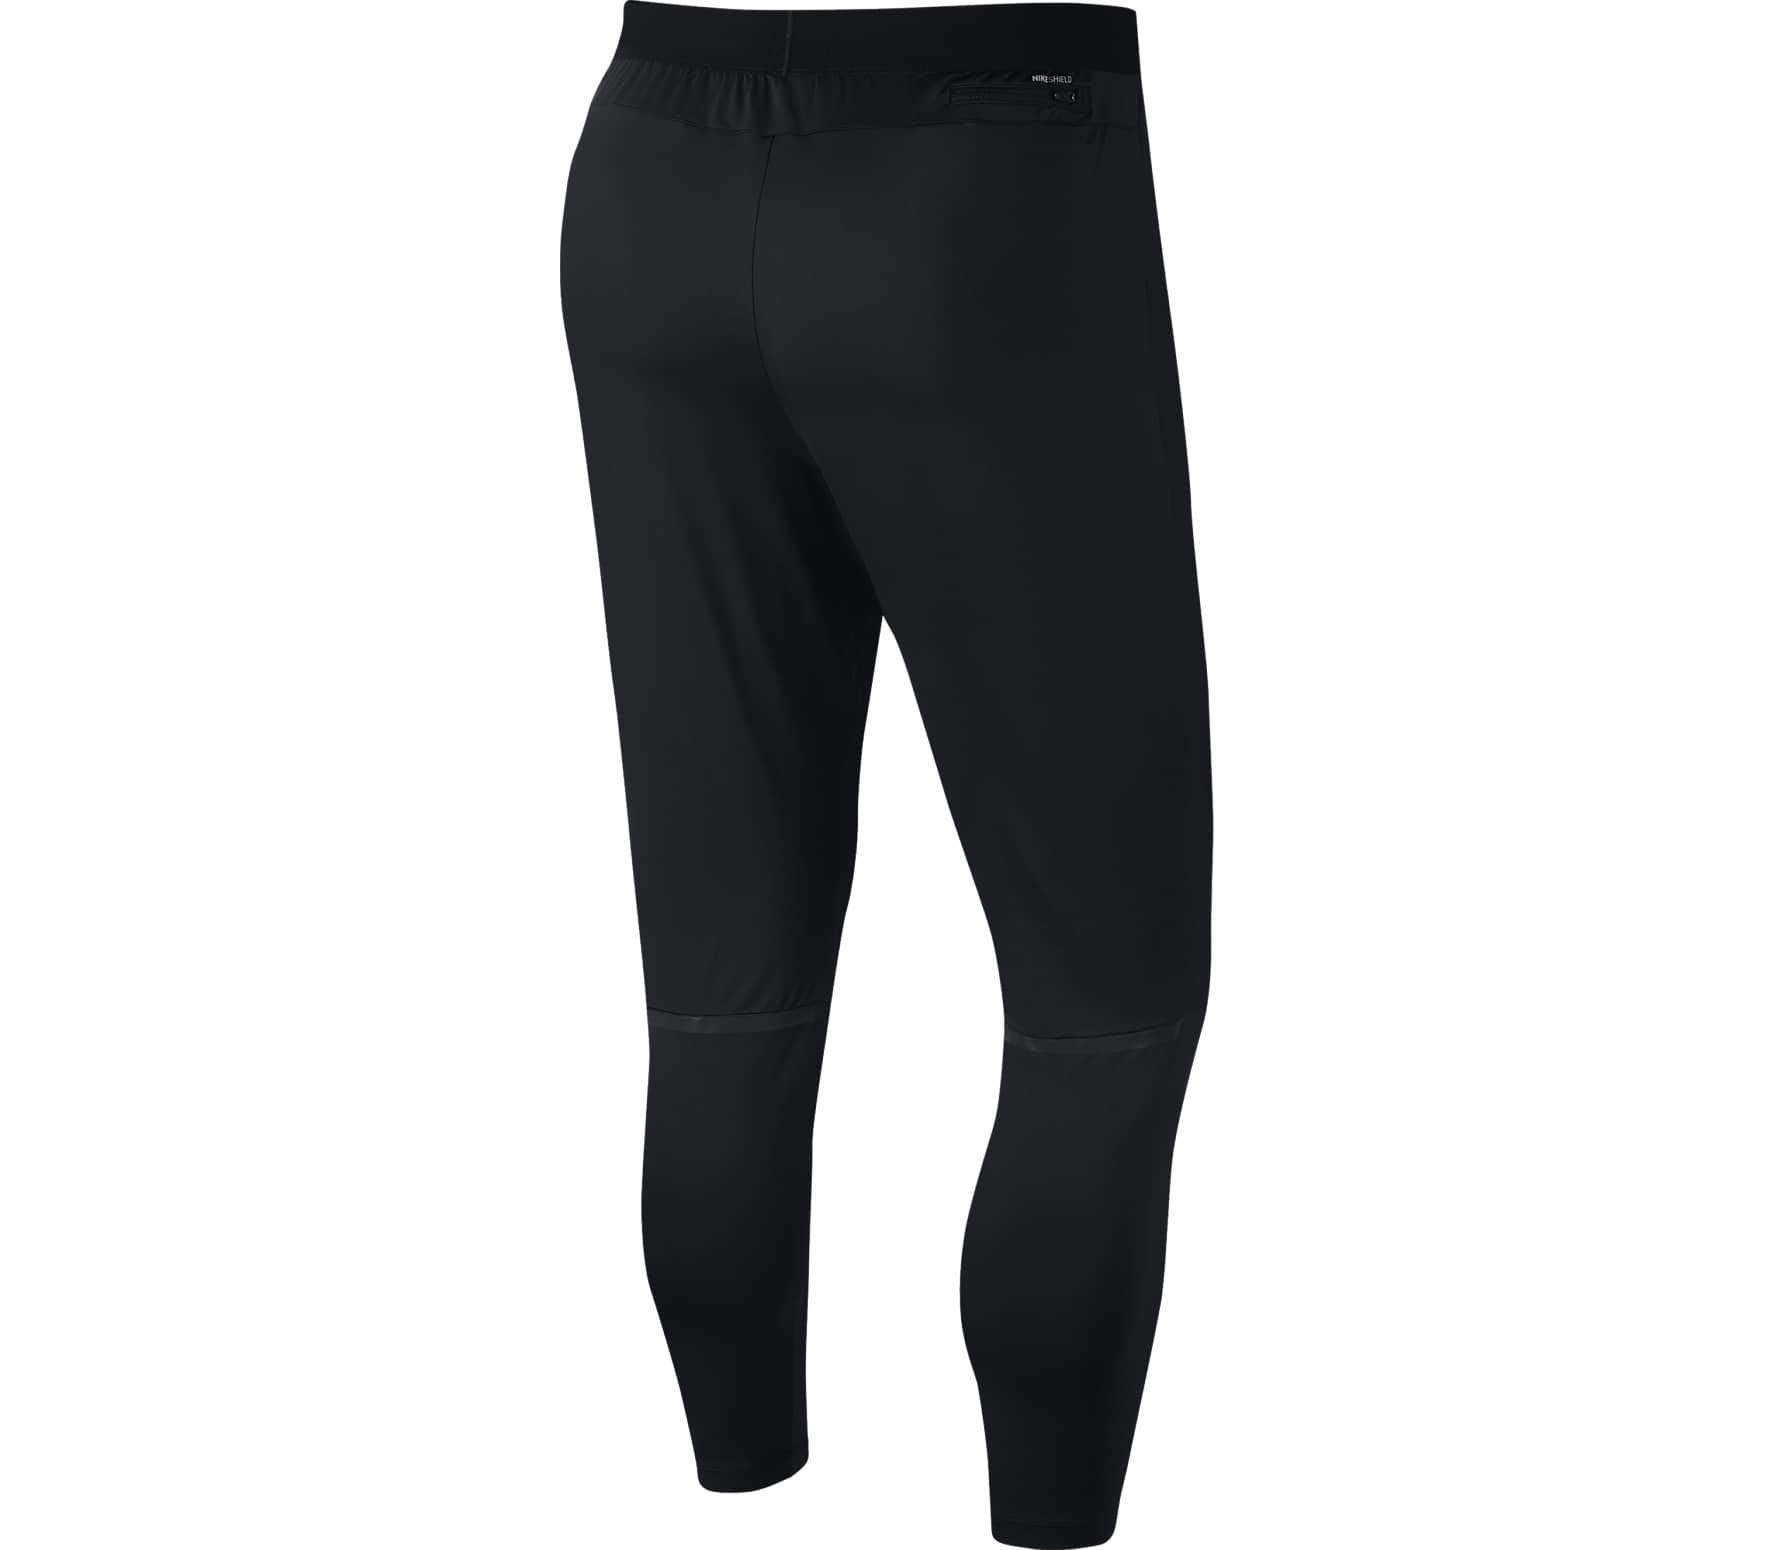 Nike Shield Swift Men's Running Pants (Black, Large)